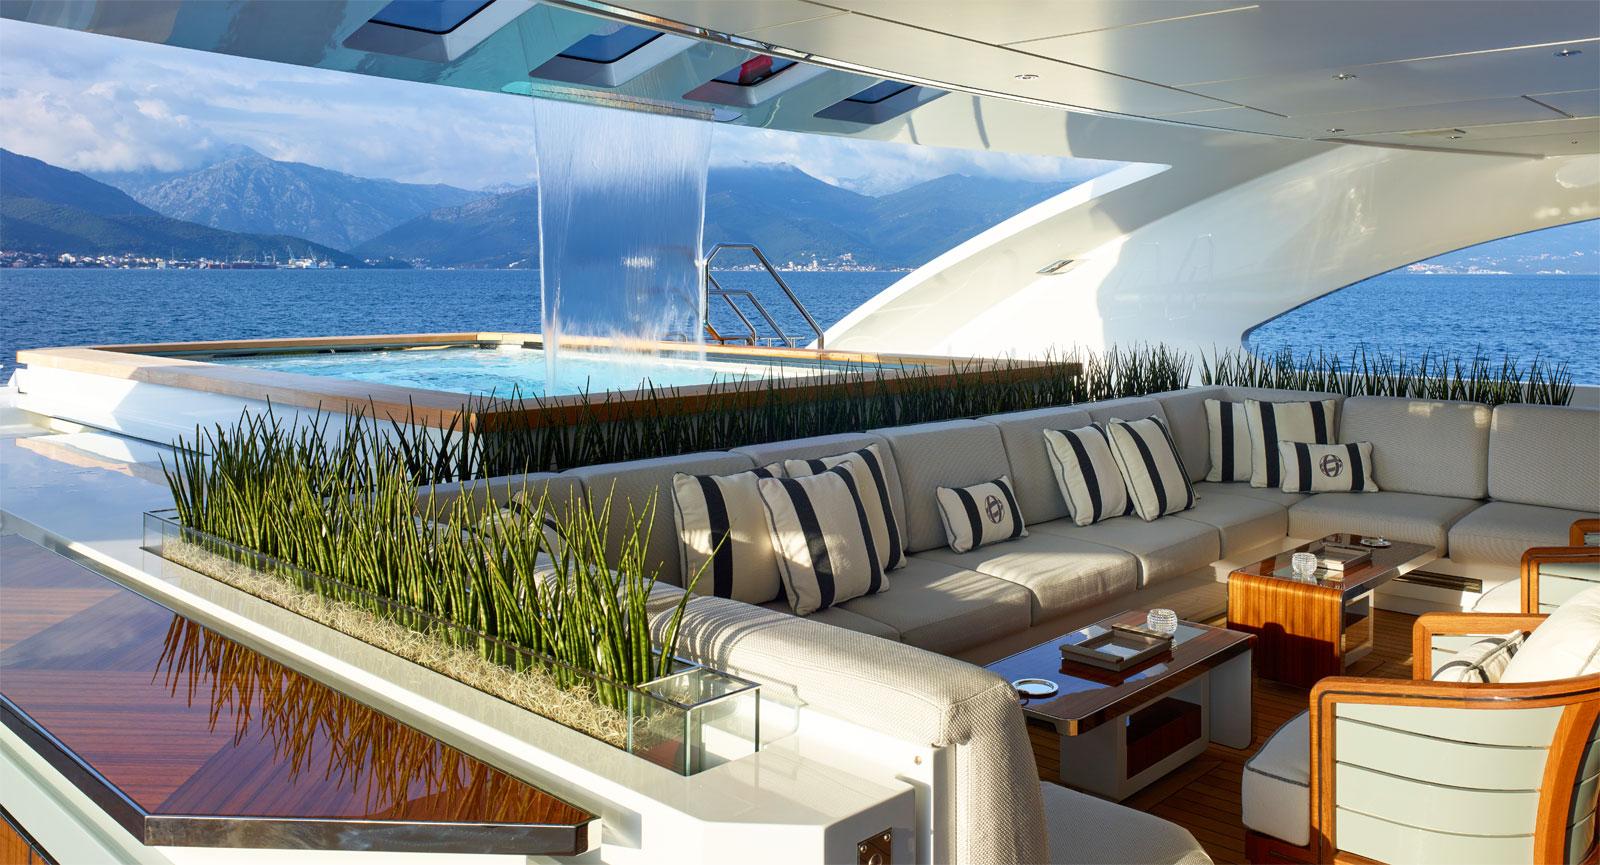 An Amazing Experience In The Côte d'Azur Aboard The Heesen Galactica Super Nova 6